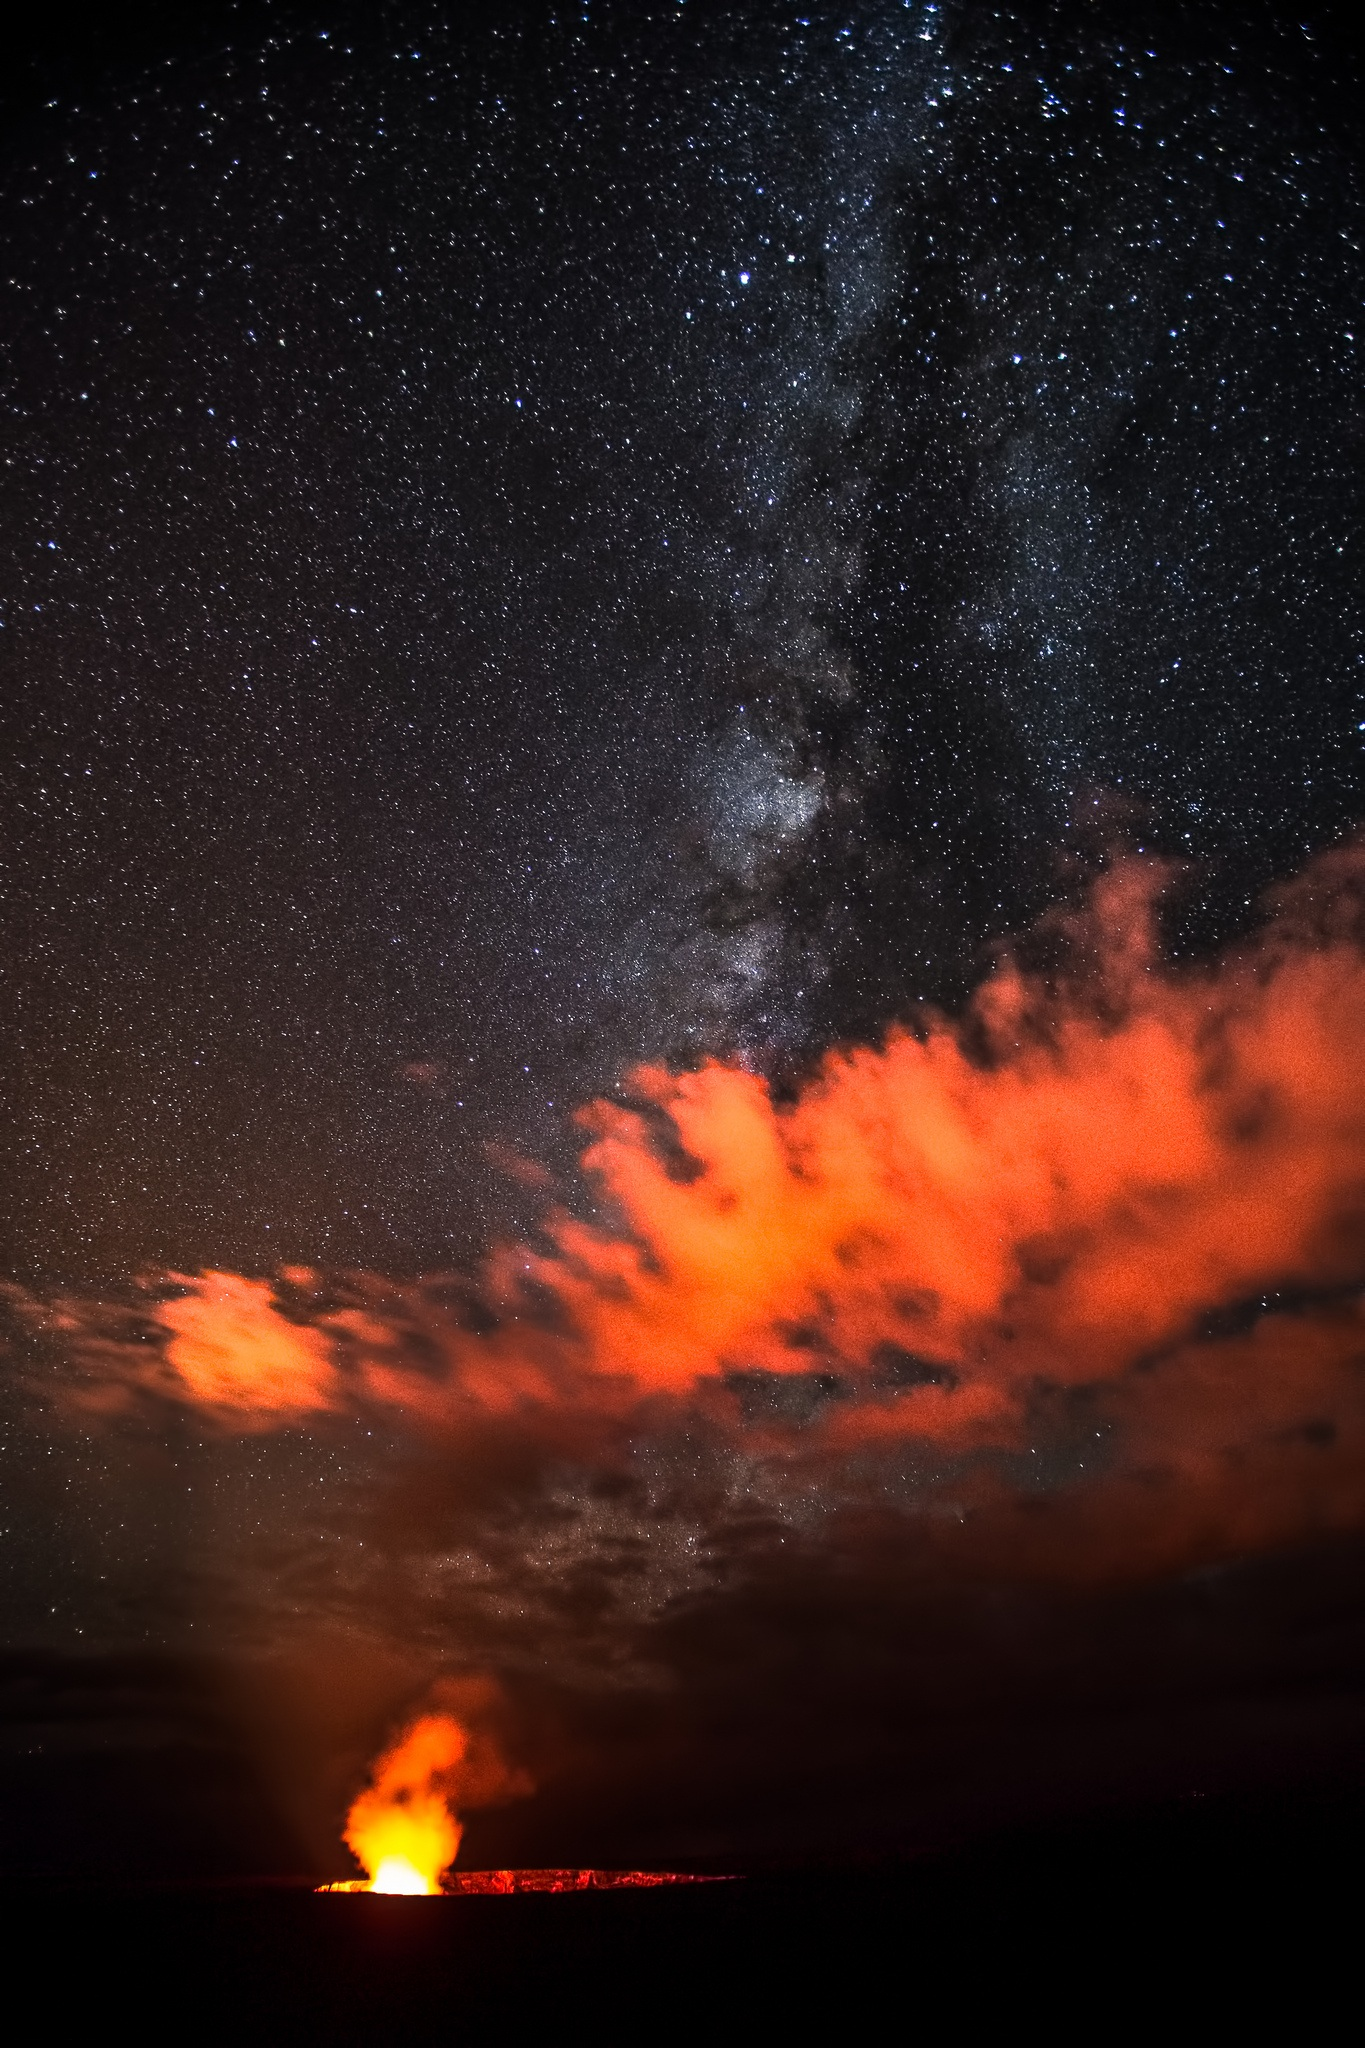 Milky Way Glows Over Hawaiʻi's Halemaʻumaʻu Crater